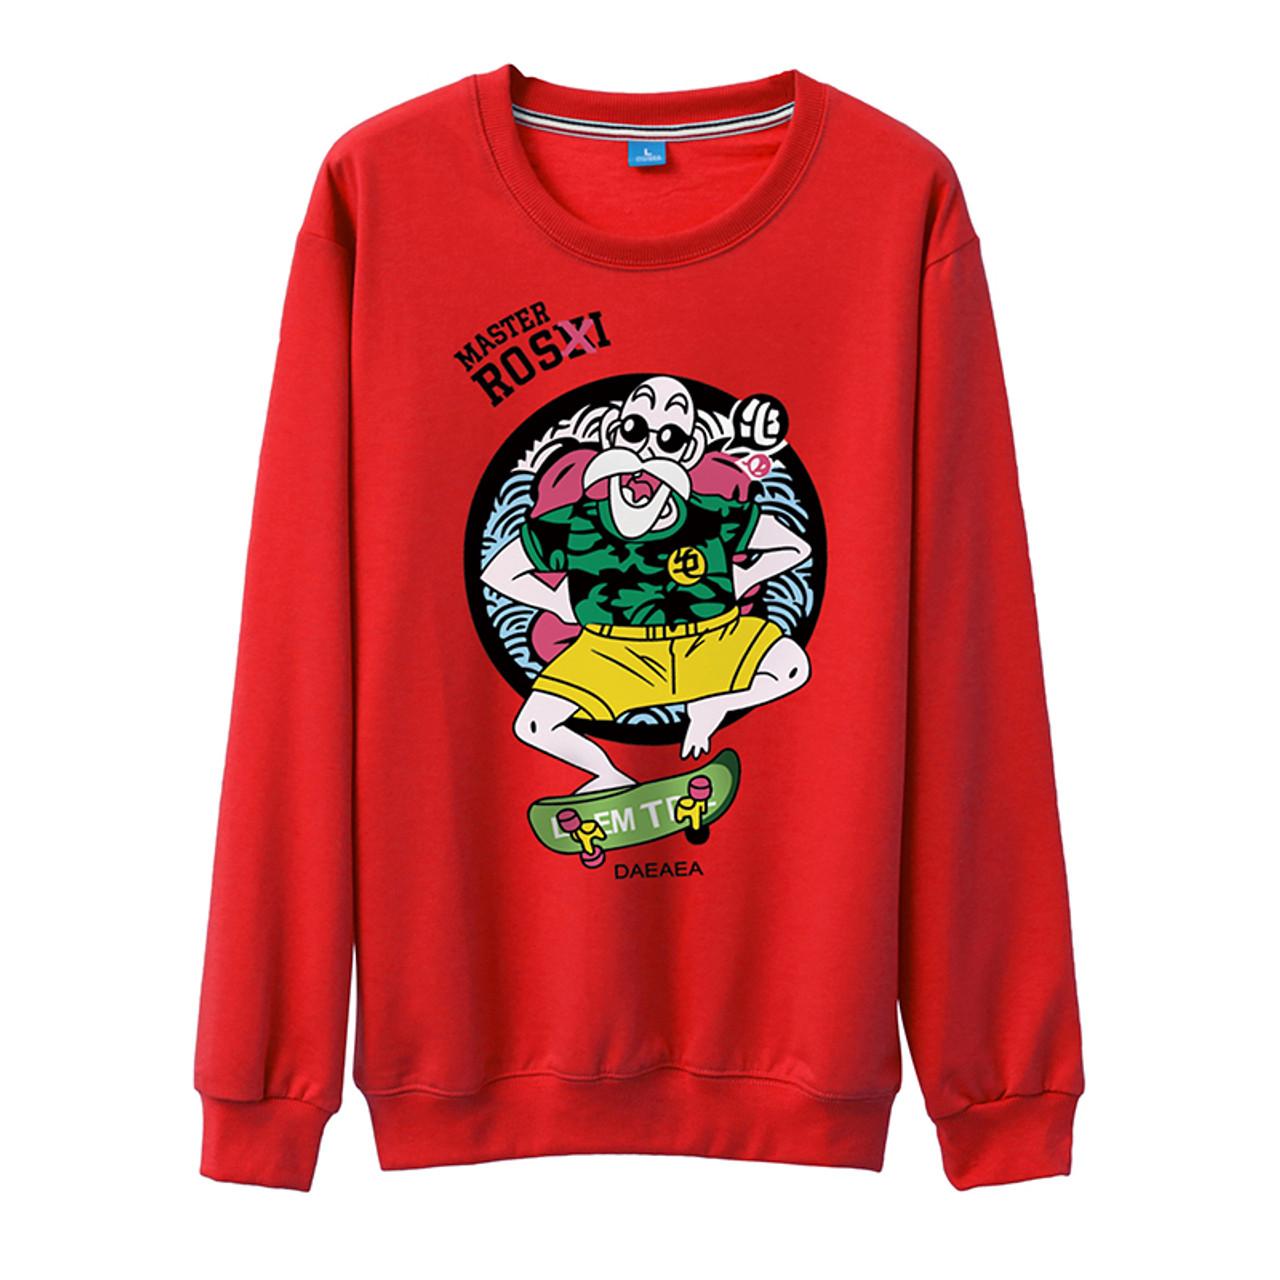 fde0534a 2018 Women Autumn Casual Hooded Sweatshirt Female Funny Cartoon Printed  Long Sleeve O Neck Pullovers oversized ...